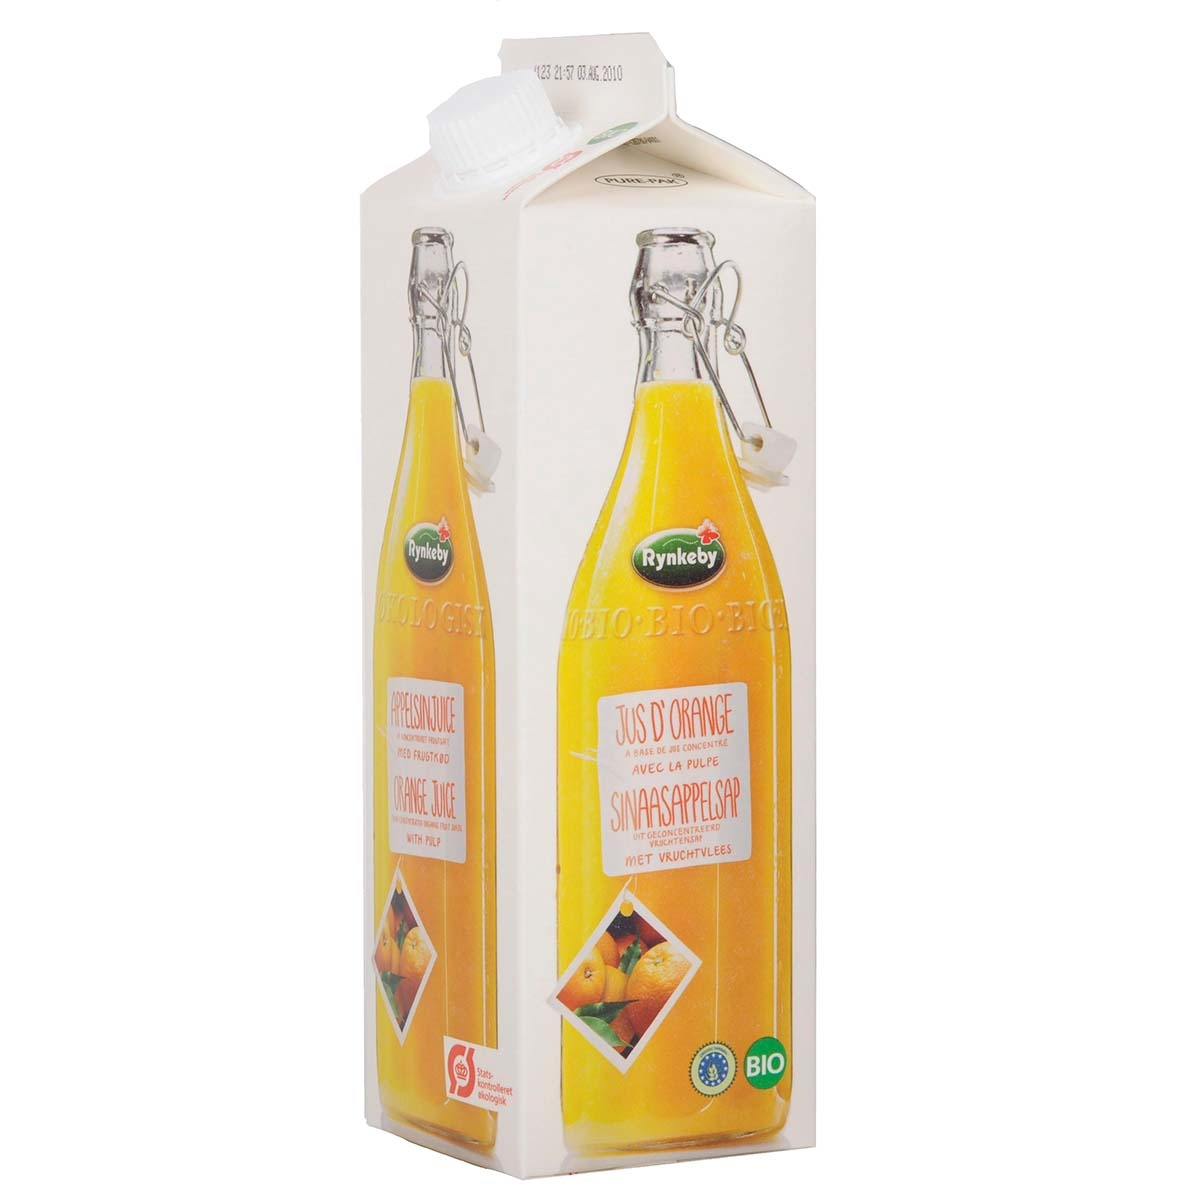 Rynkeby Foods sinaasappelsap (tetra) Biologisch